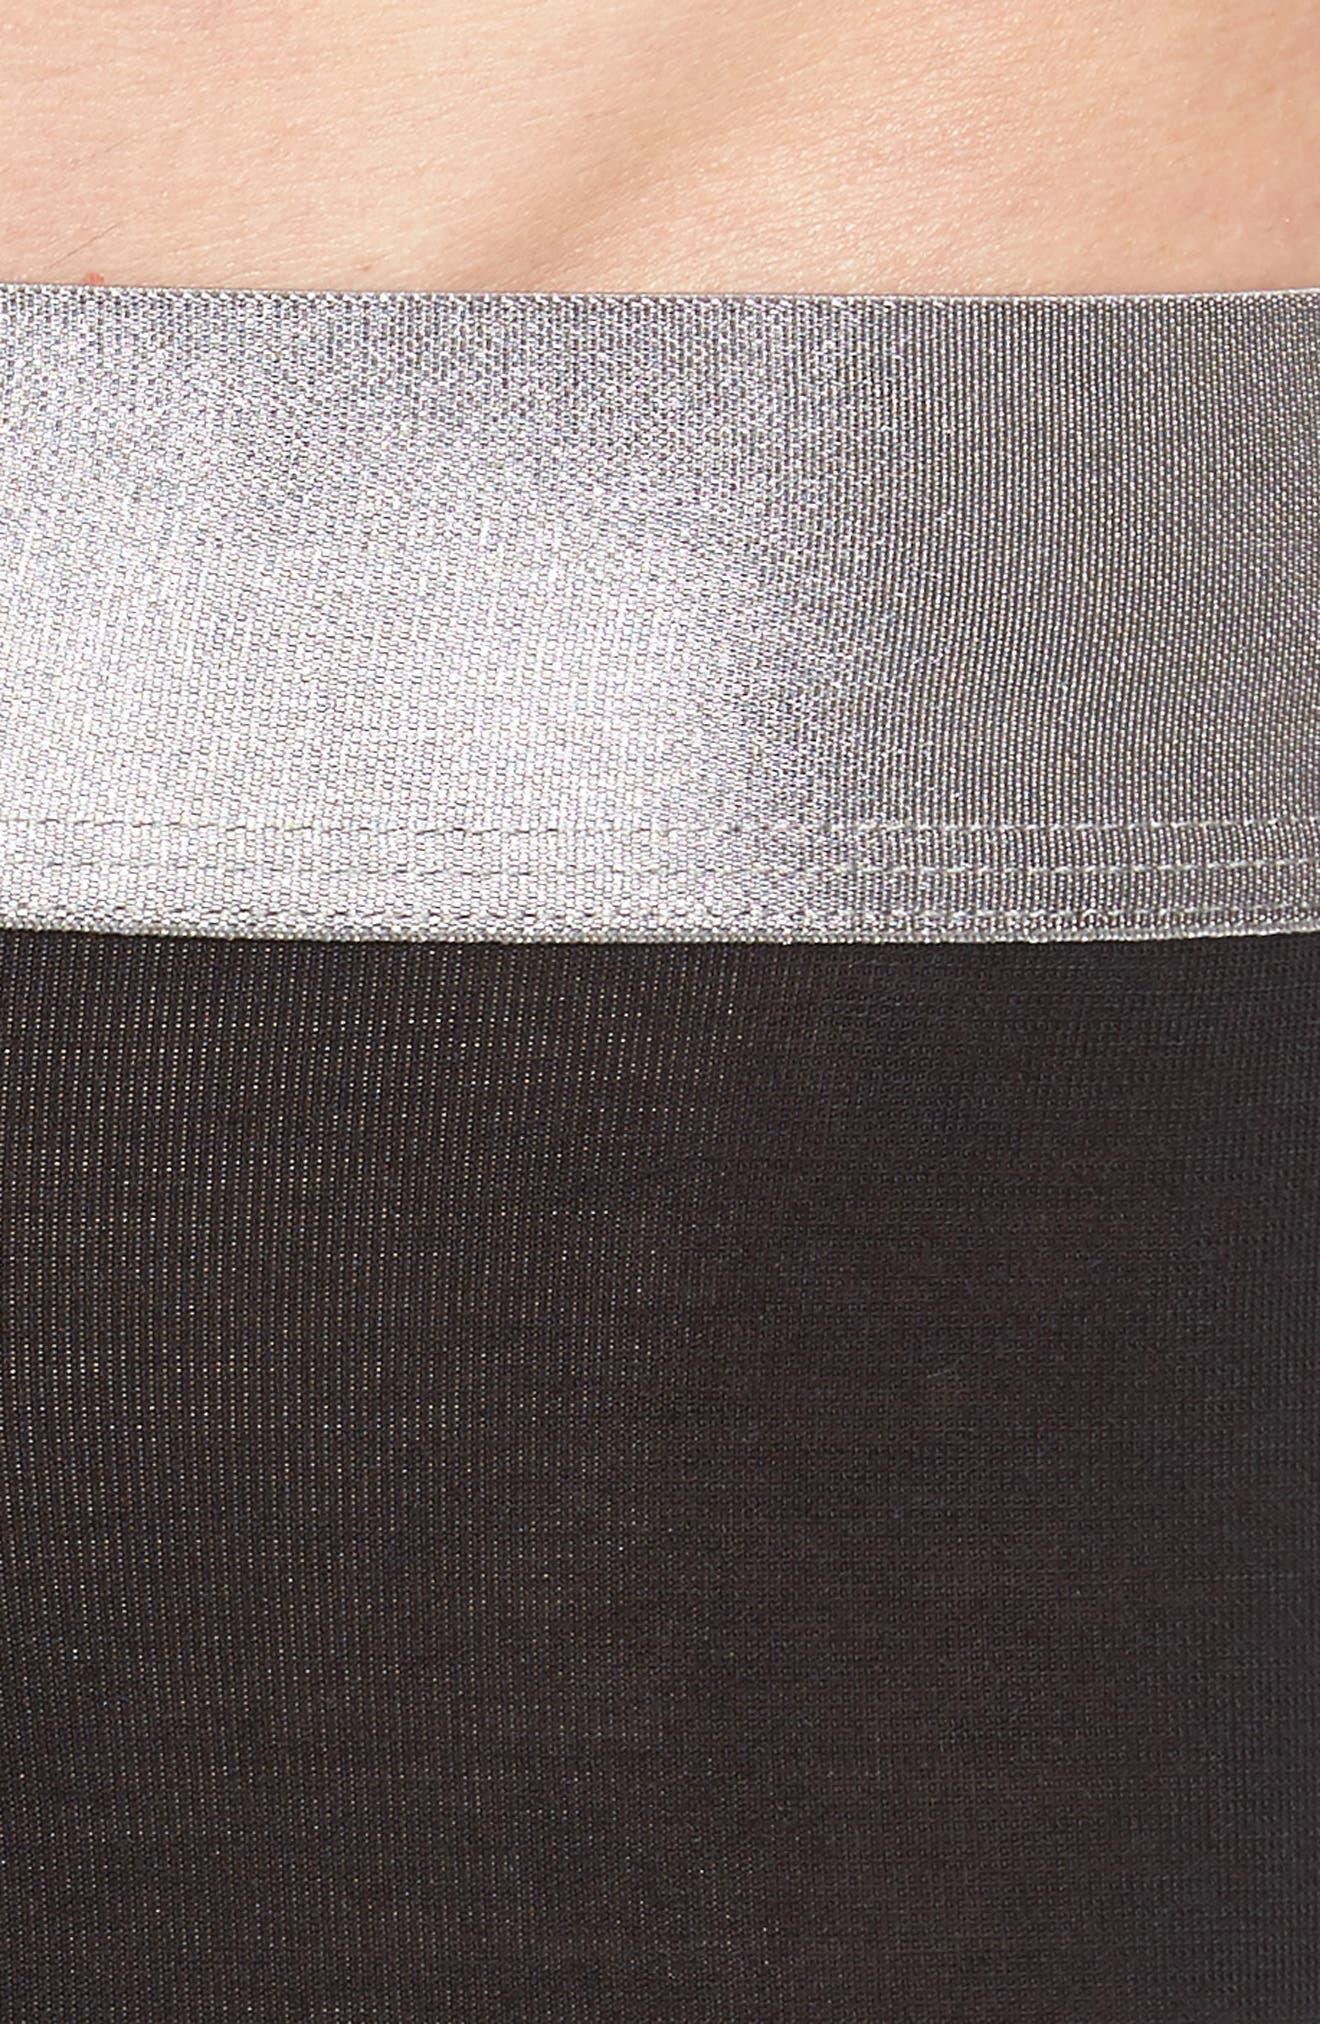 Second Skin Titanium Trunks,                             Alternate thumbnail 4, color,                             BLACK